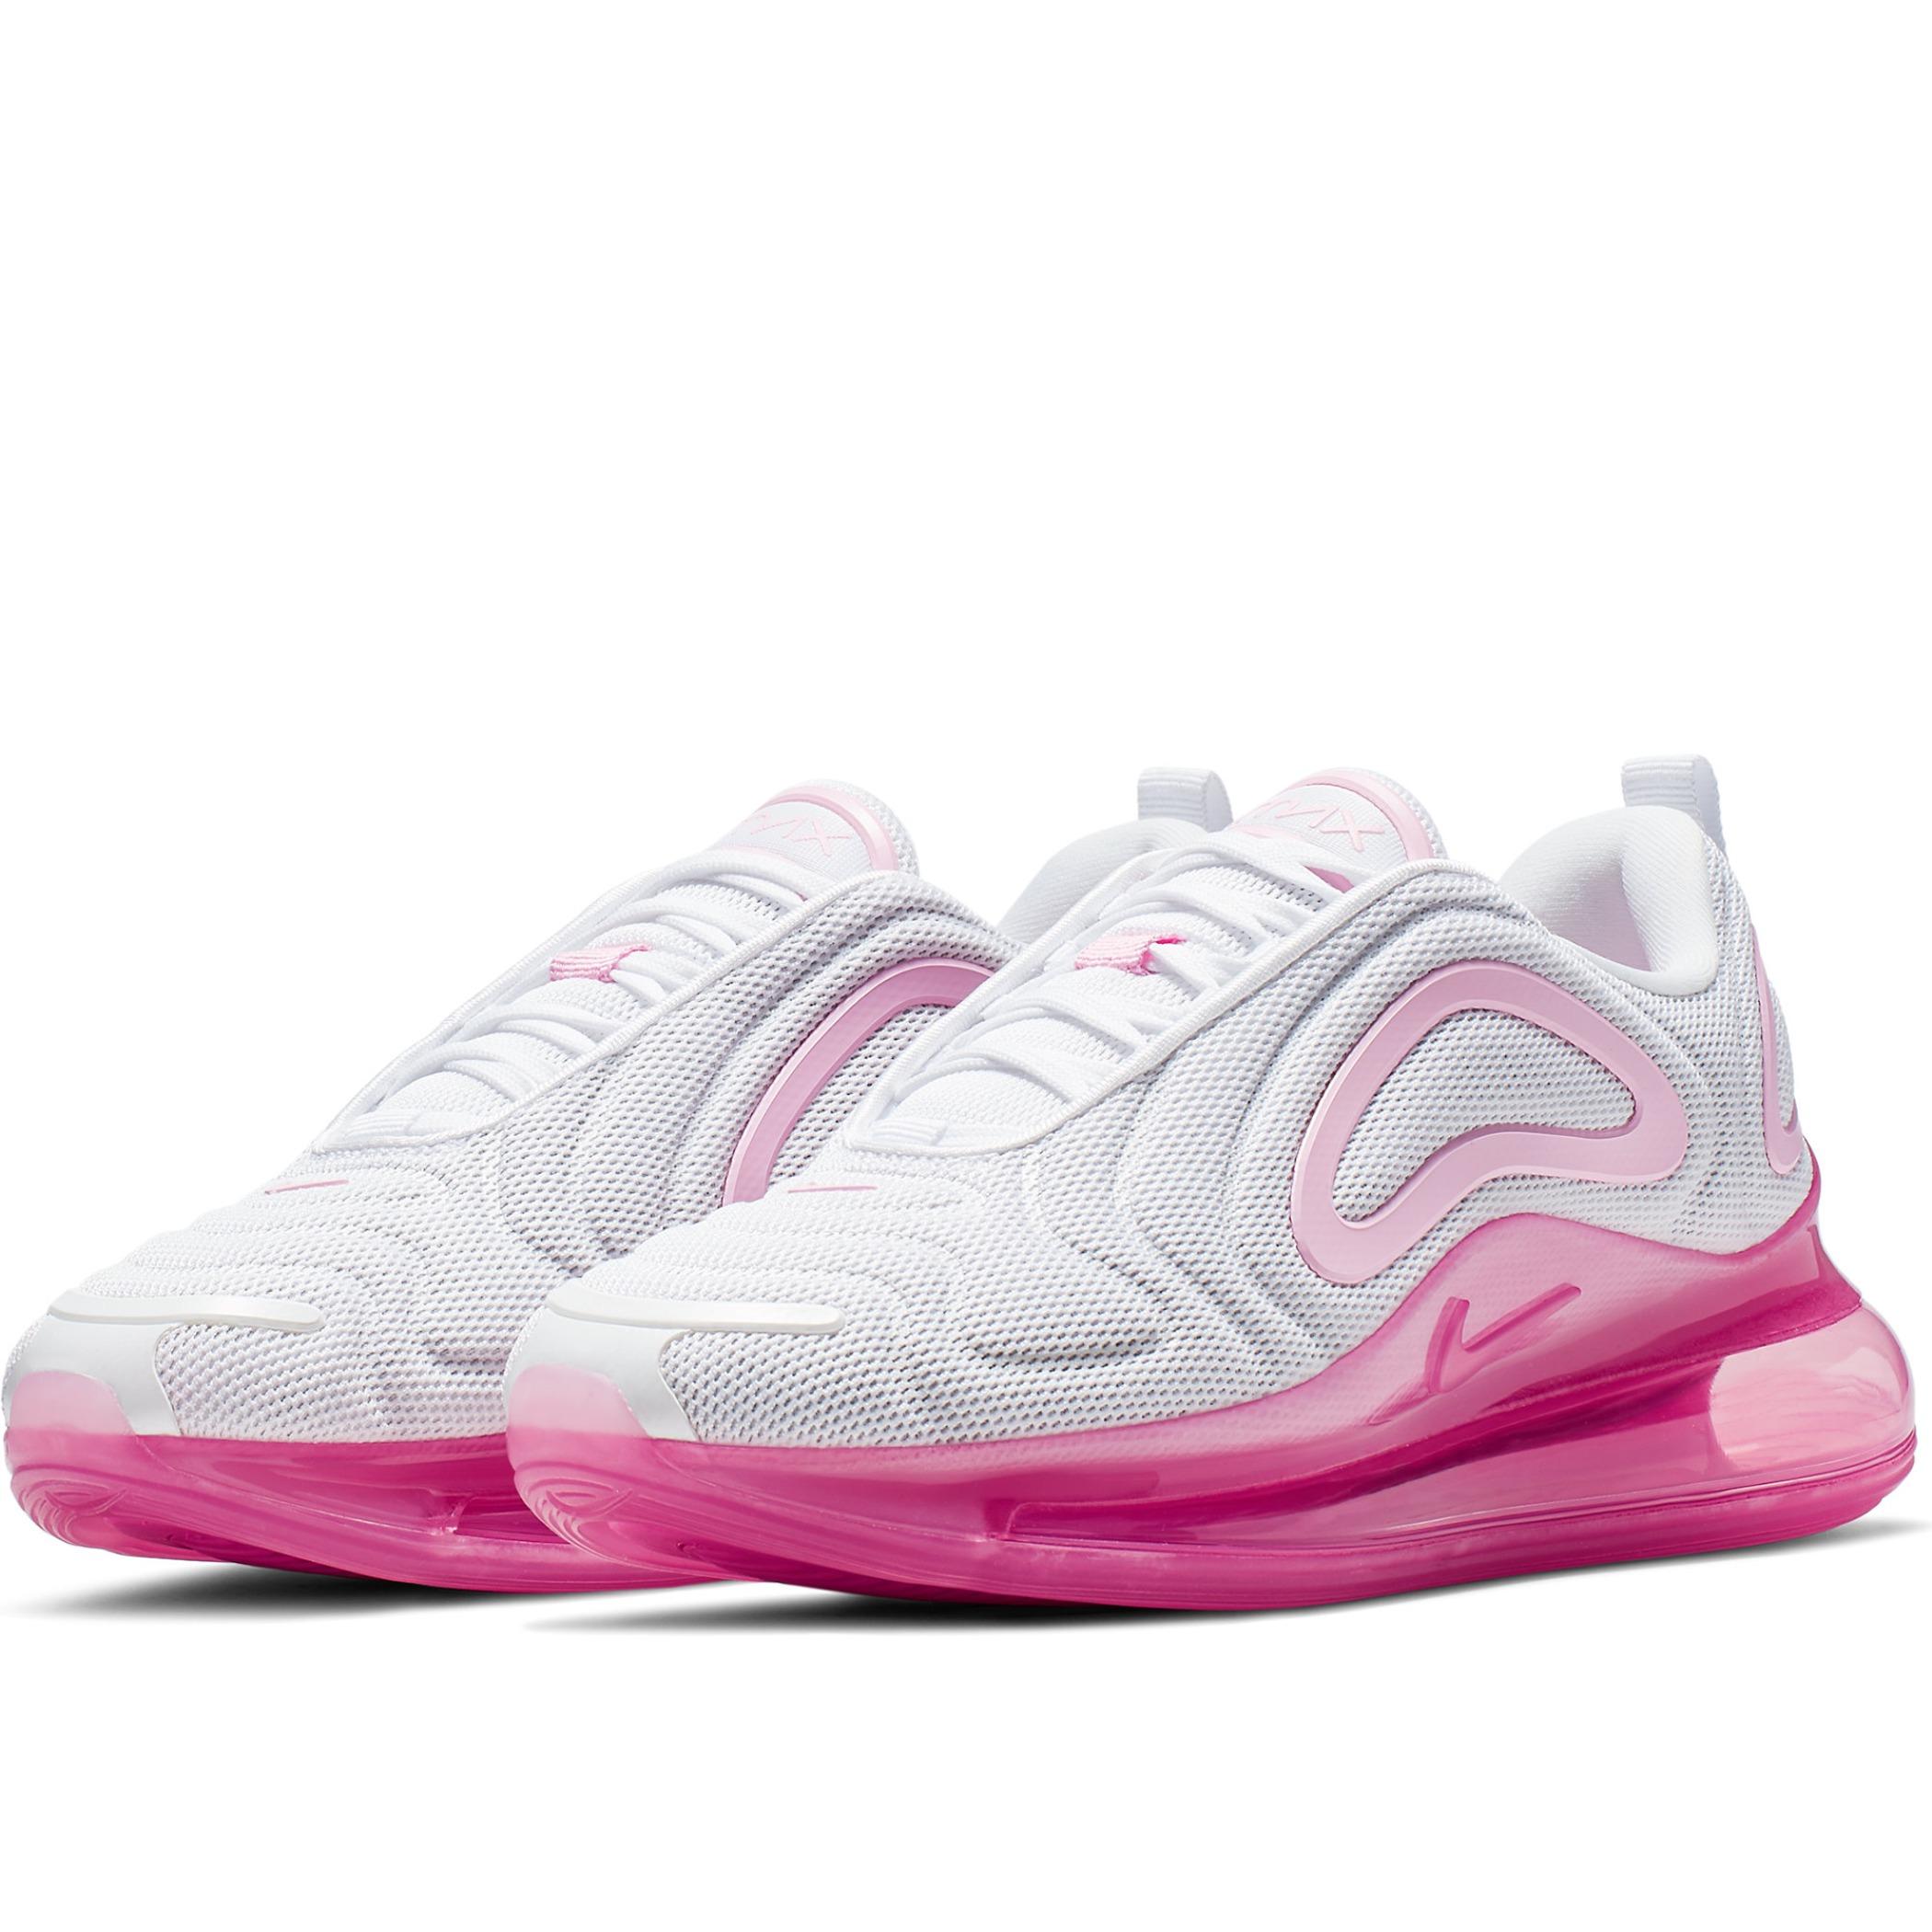 a9525a88 Женские кроссовки Nike Air Max 720 White/Pink Rise-Laser Fuchsia - фото 2